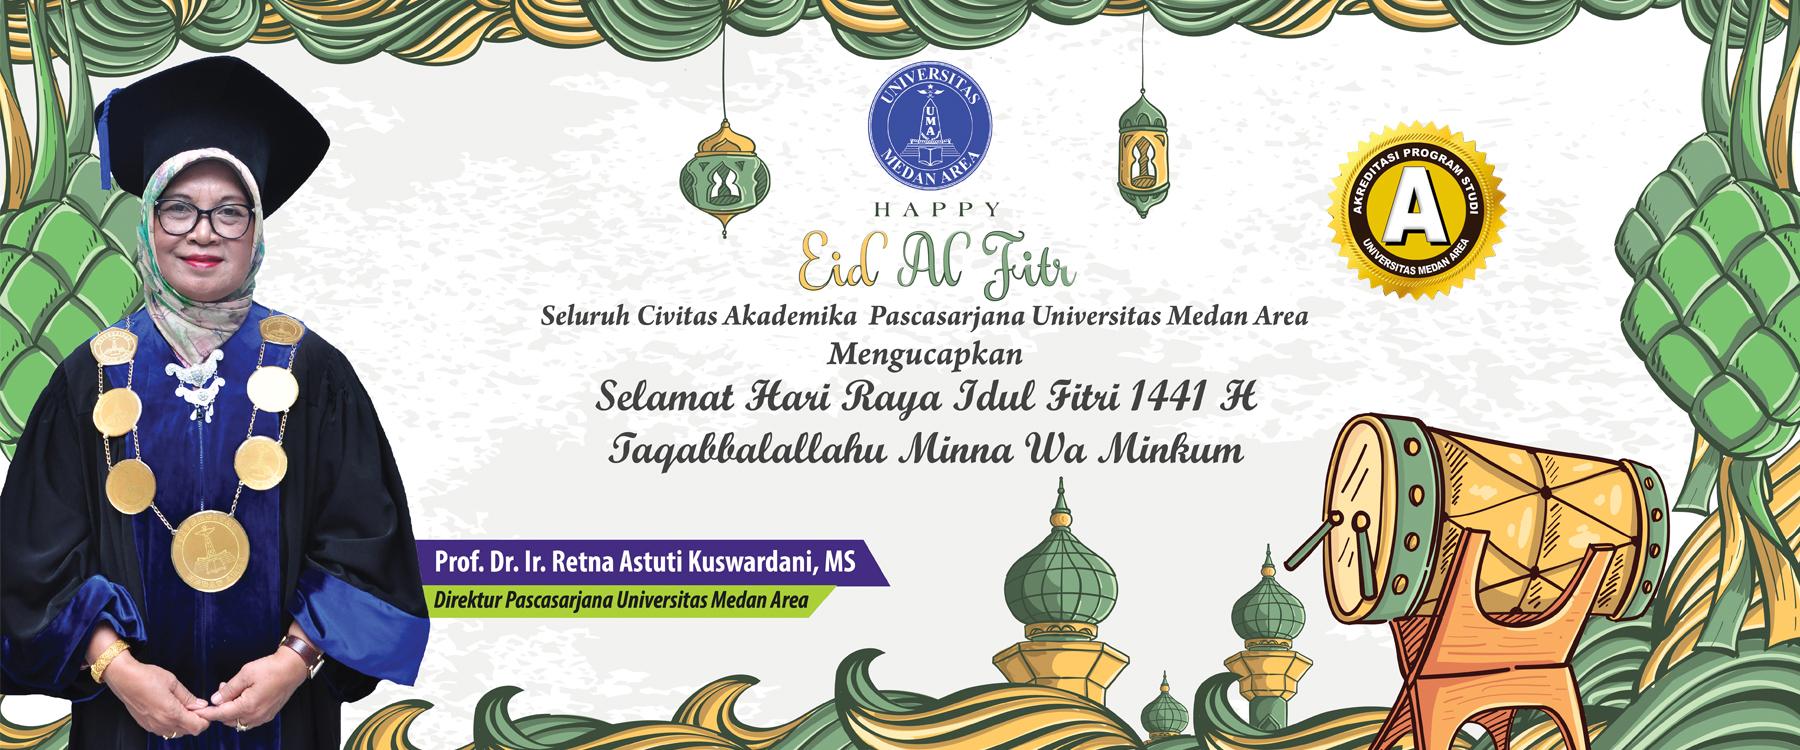 Slider Hari Raya Idul Fitri 1441 Hijriah